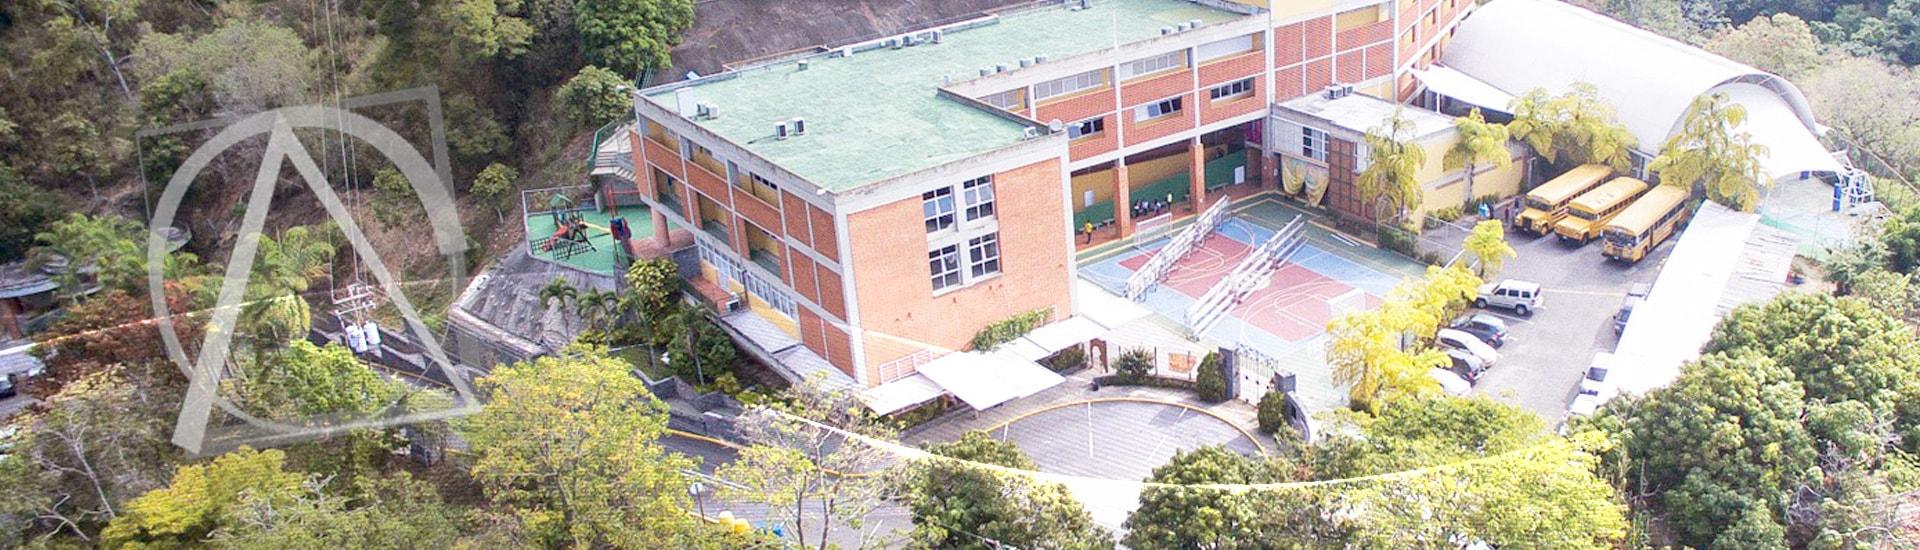 slider_colegio-min